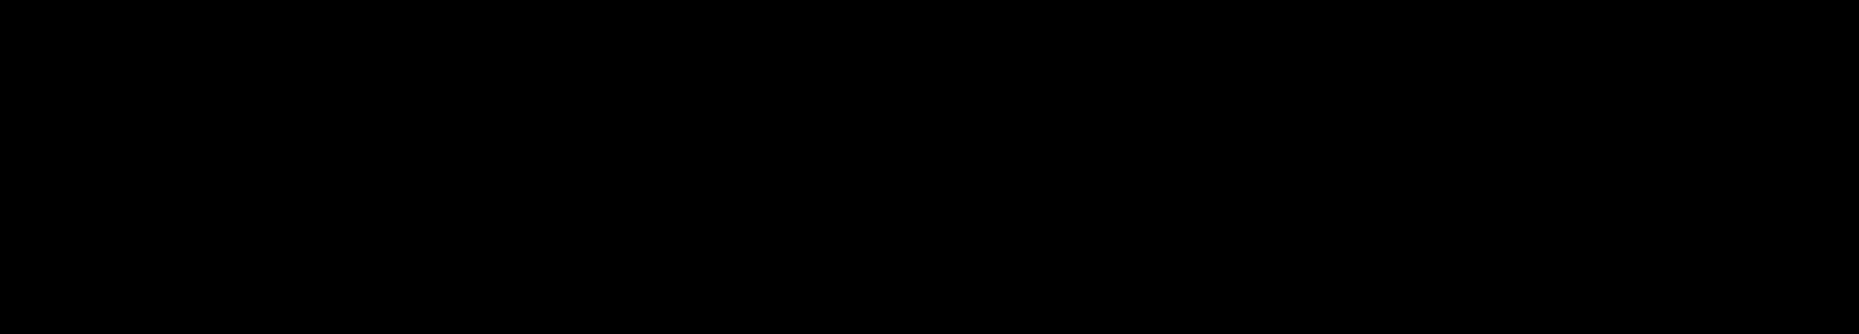 Windows 10 logo png. Microsoft s pinterest microsoftwindowslogopng